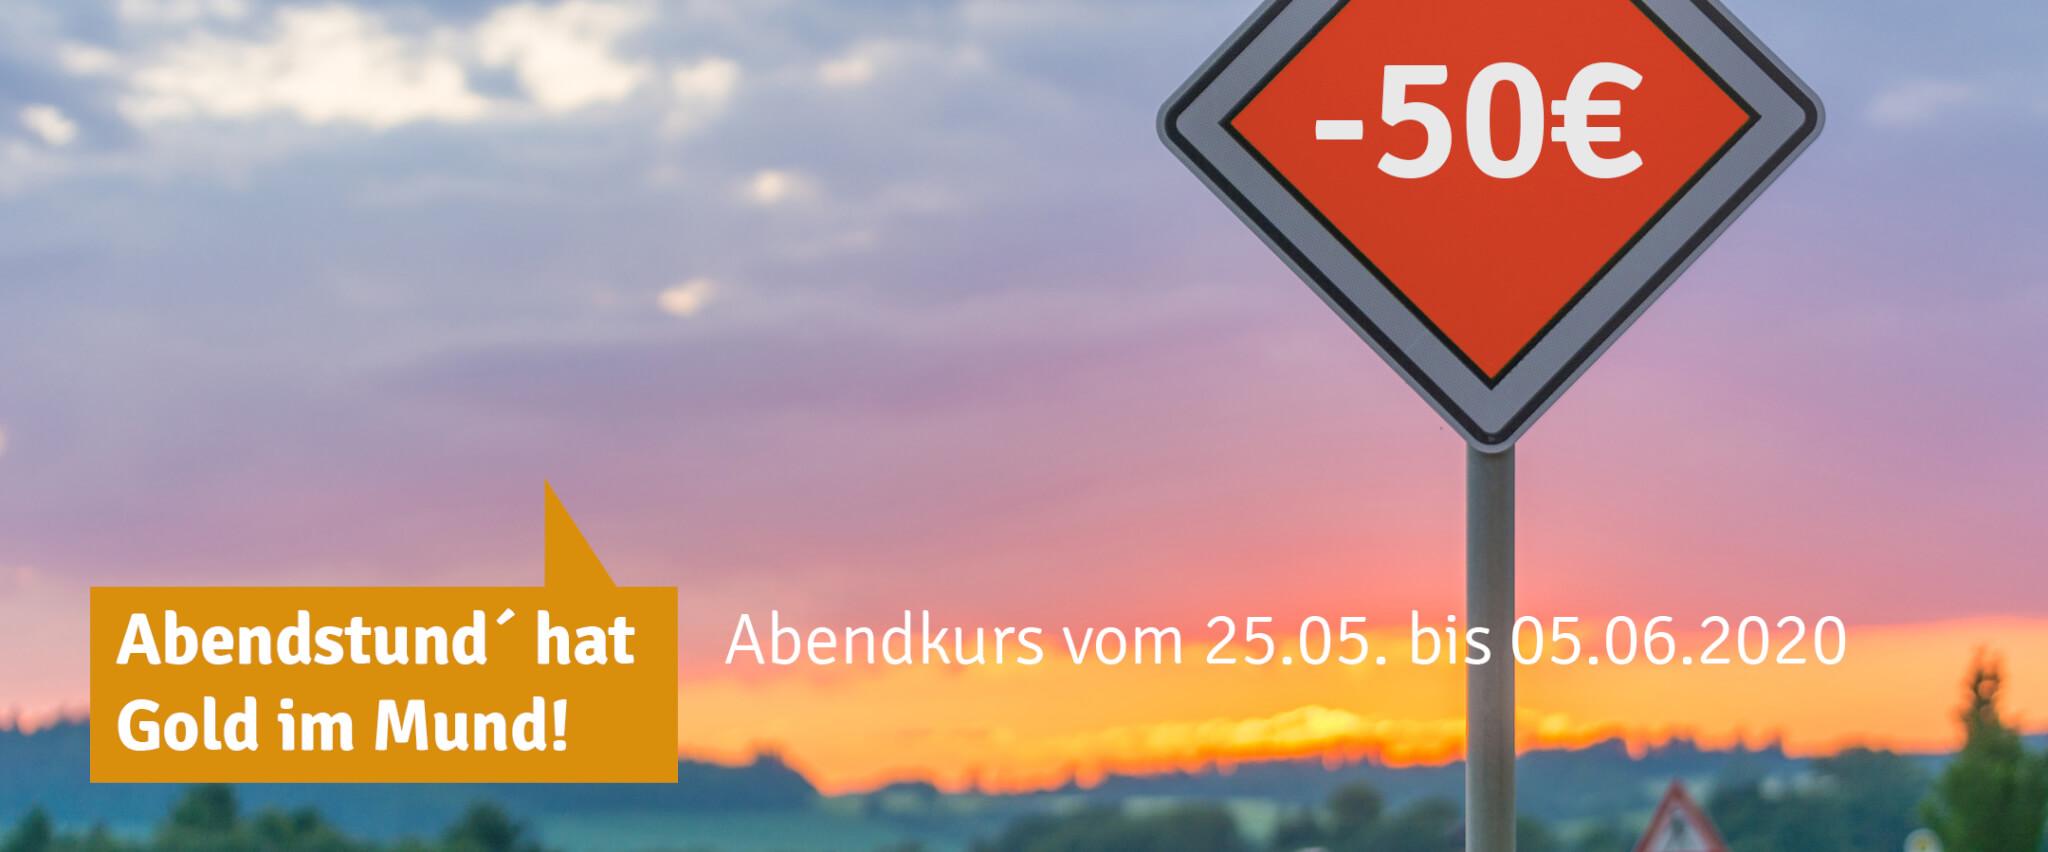 Slider_Abendkurs20-05